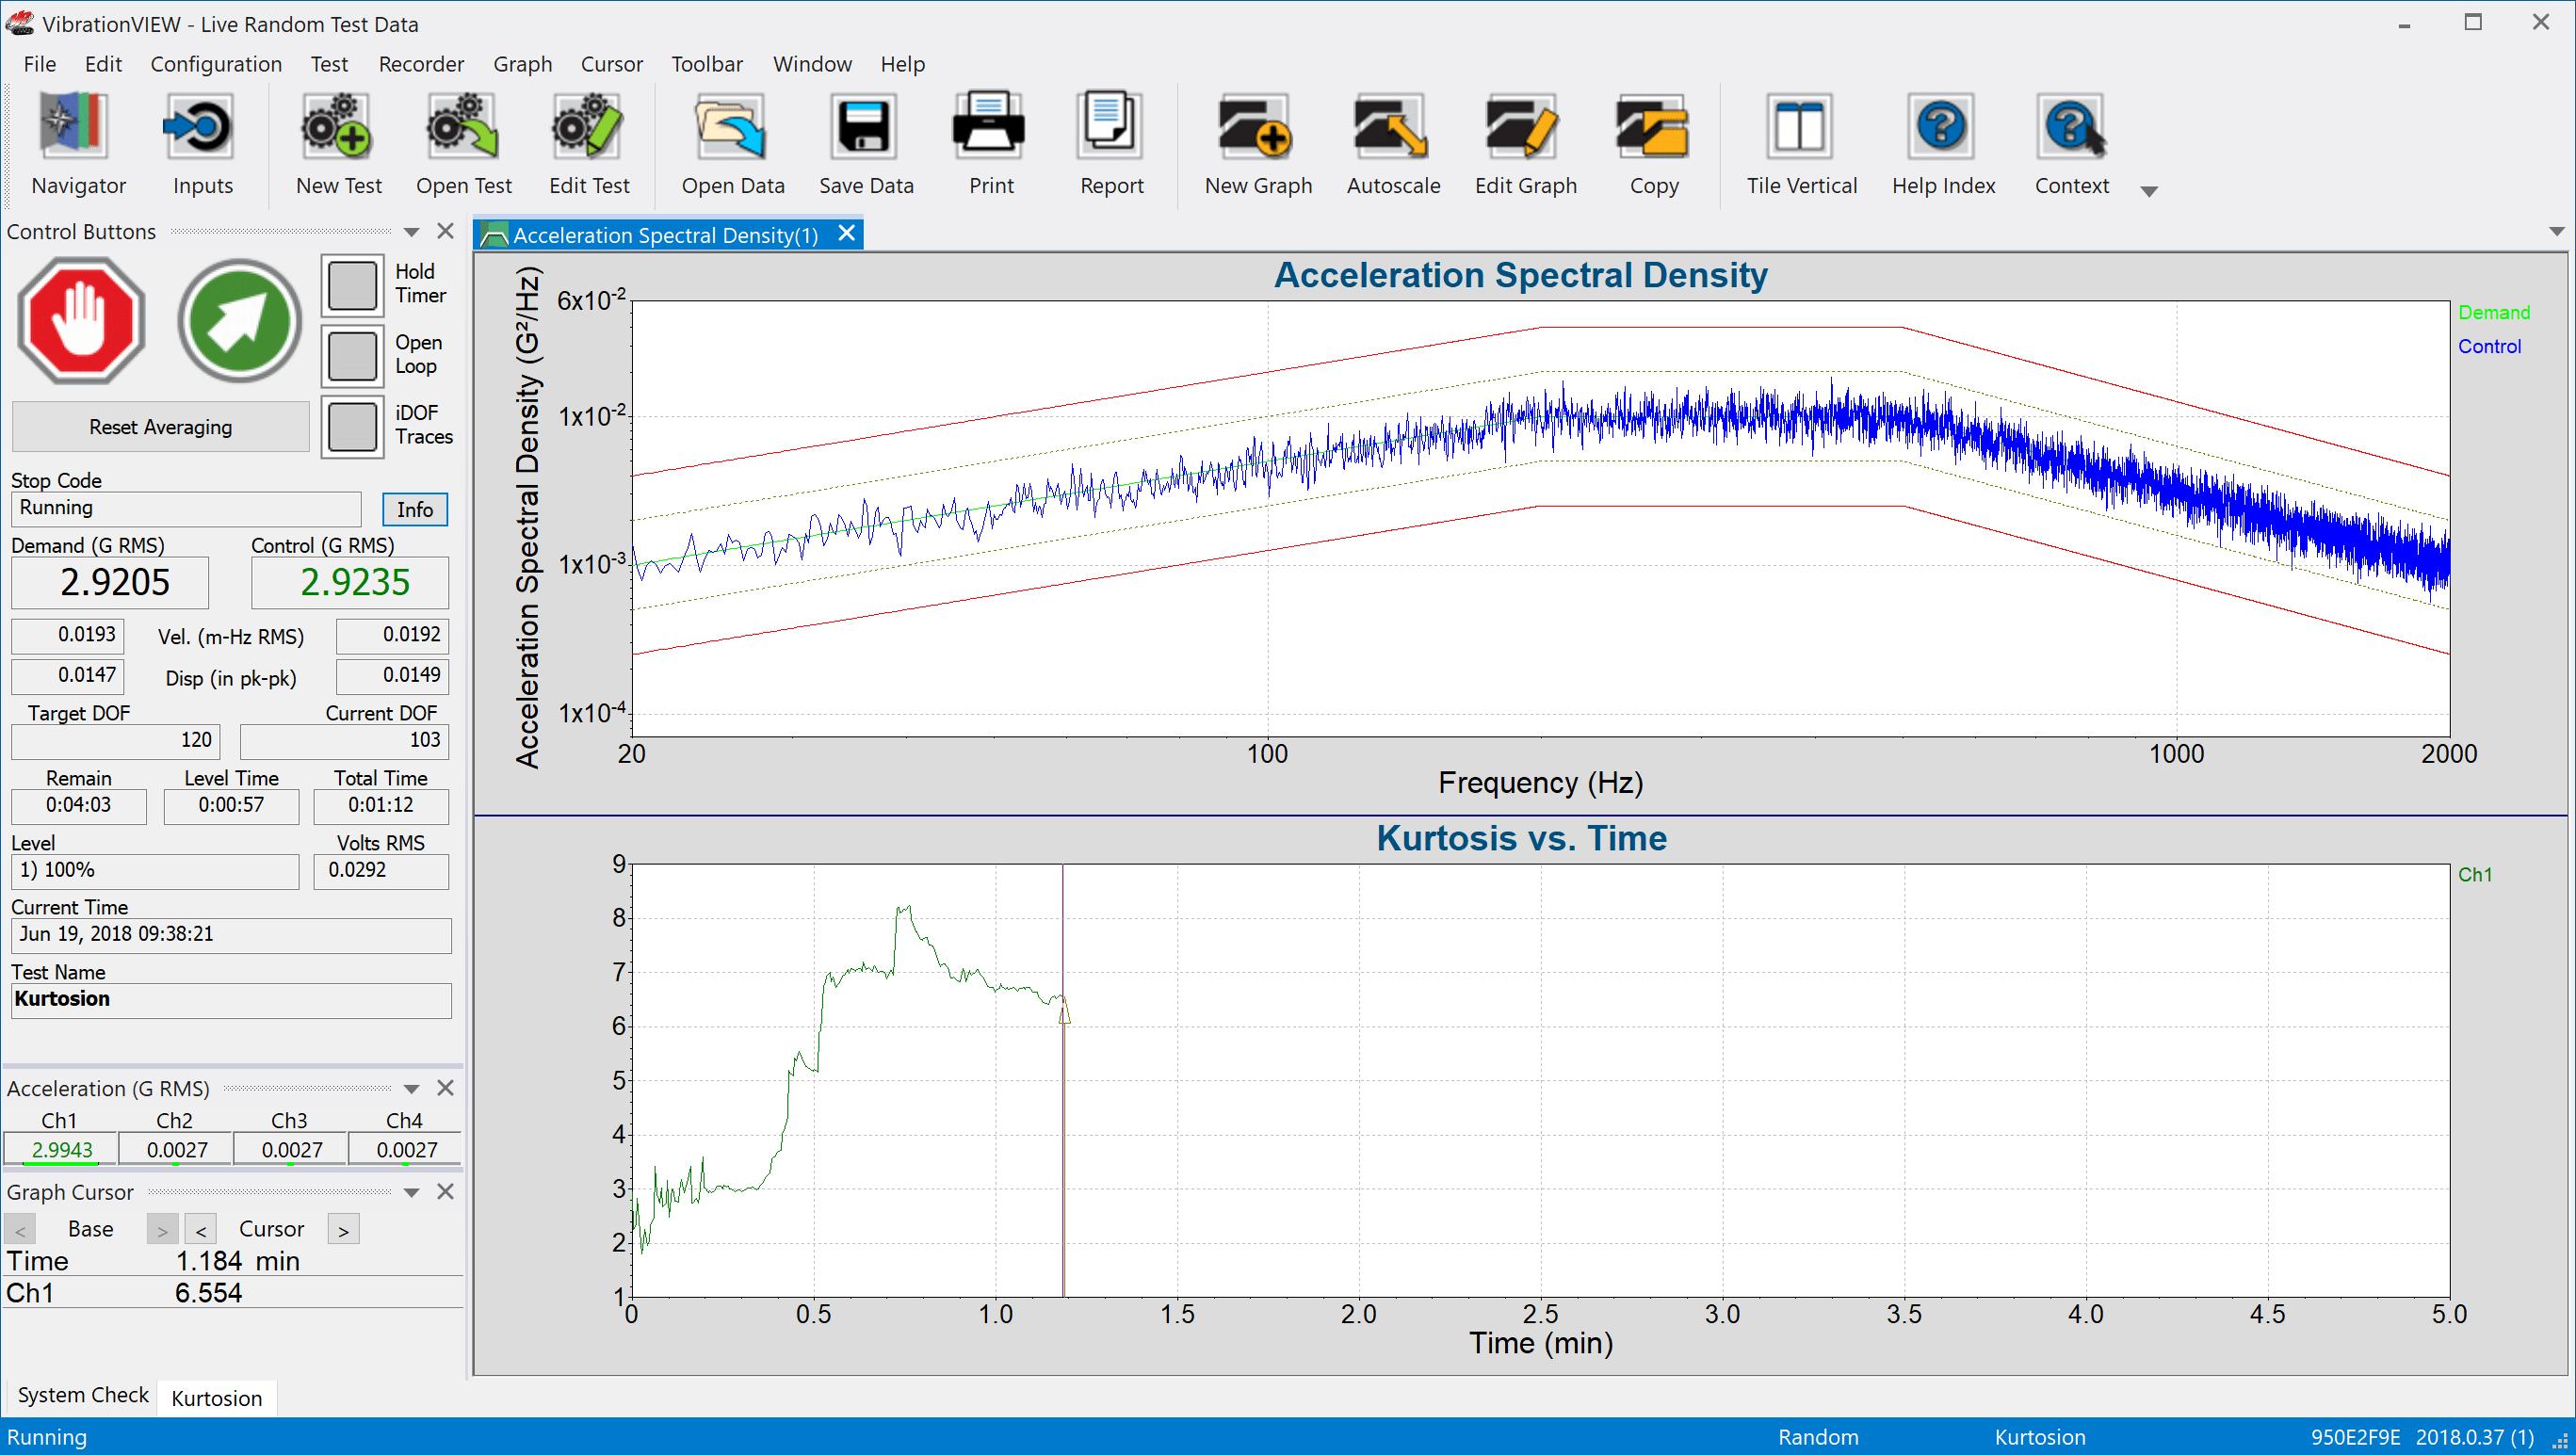 Kurtosion VibrationVIEW screenshot